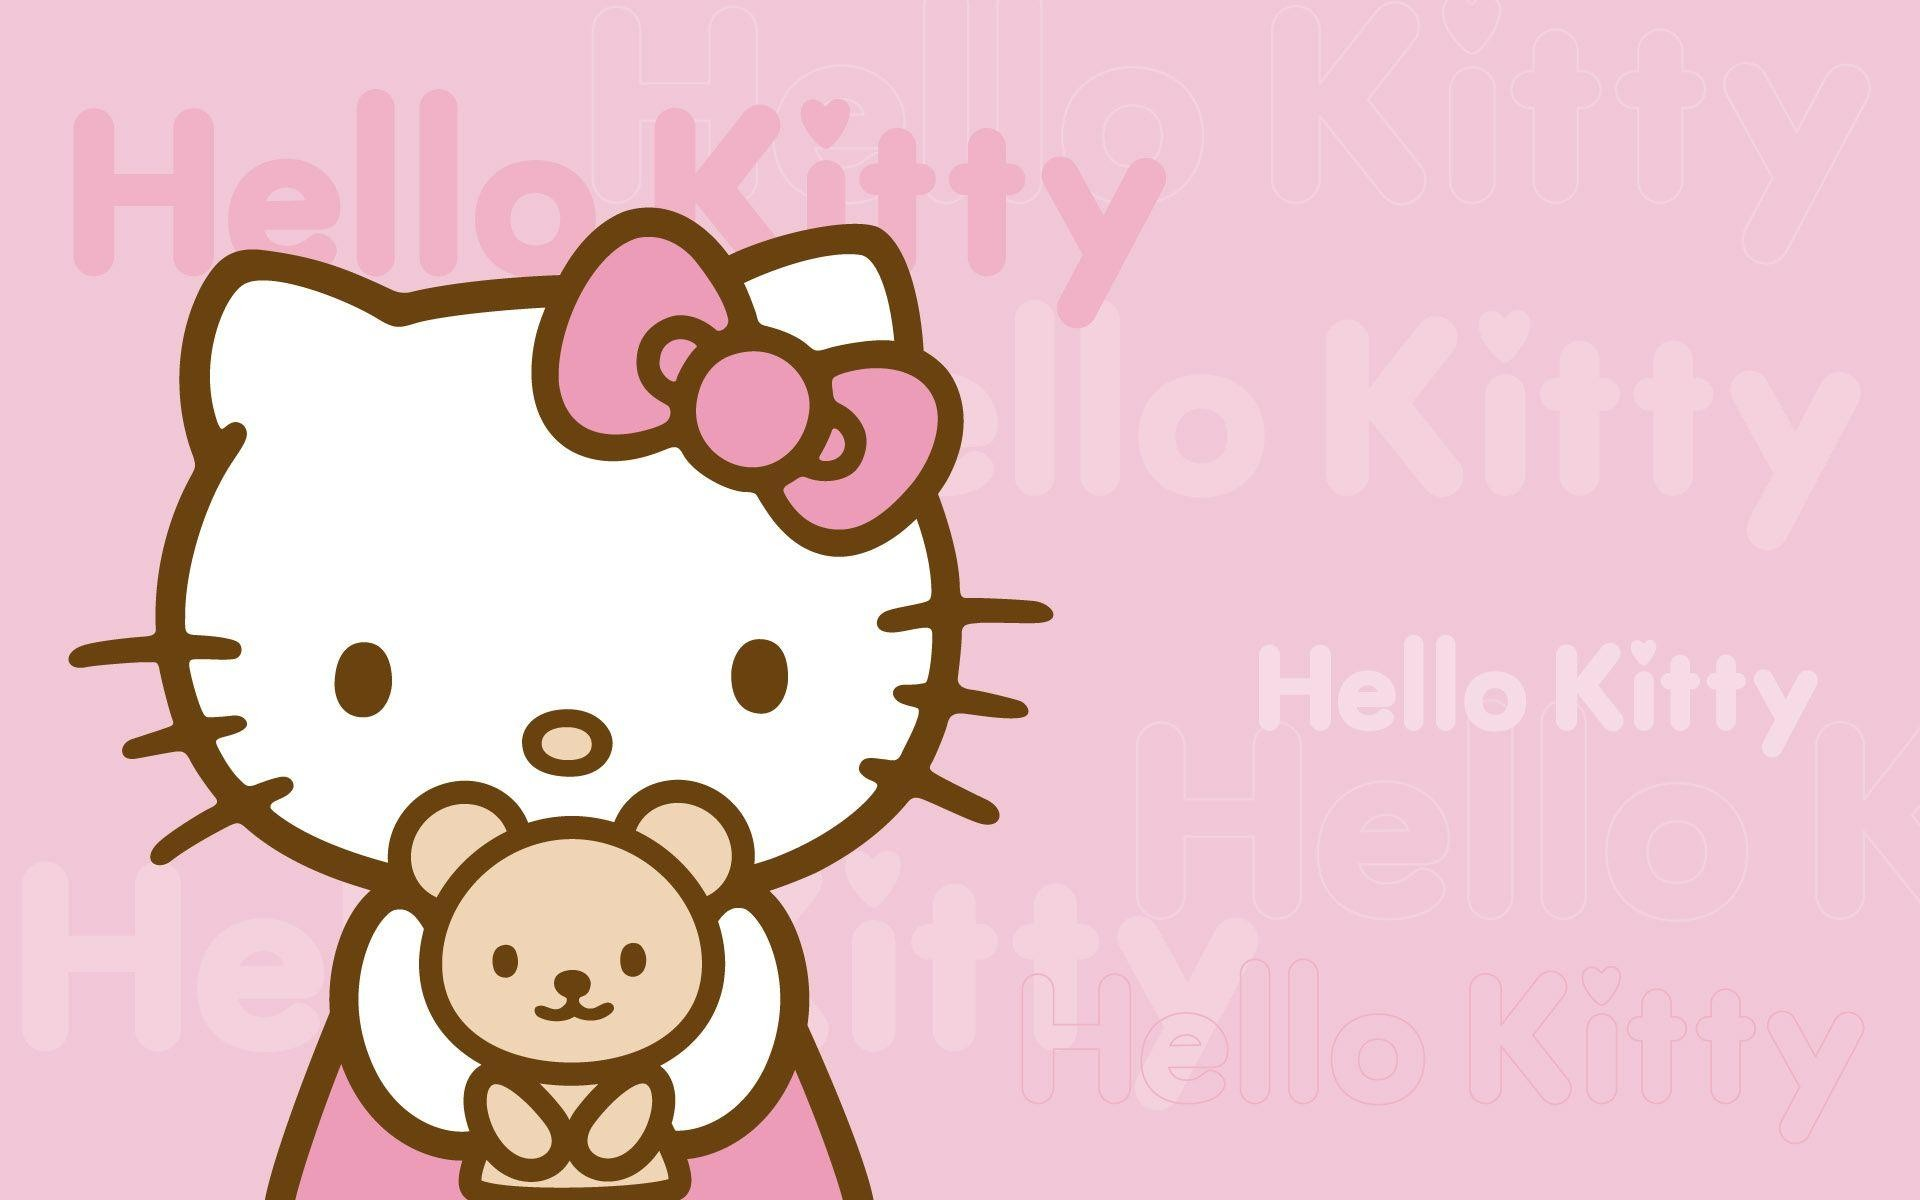 Beautiful Wallpaper Hello Kitty Face - 984722-popular-hello-kitty-desktop-background-wallpapers-1920x1200-notebook  2018_525680.jpg